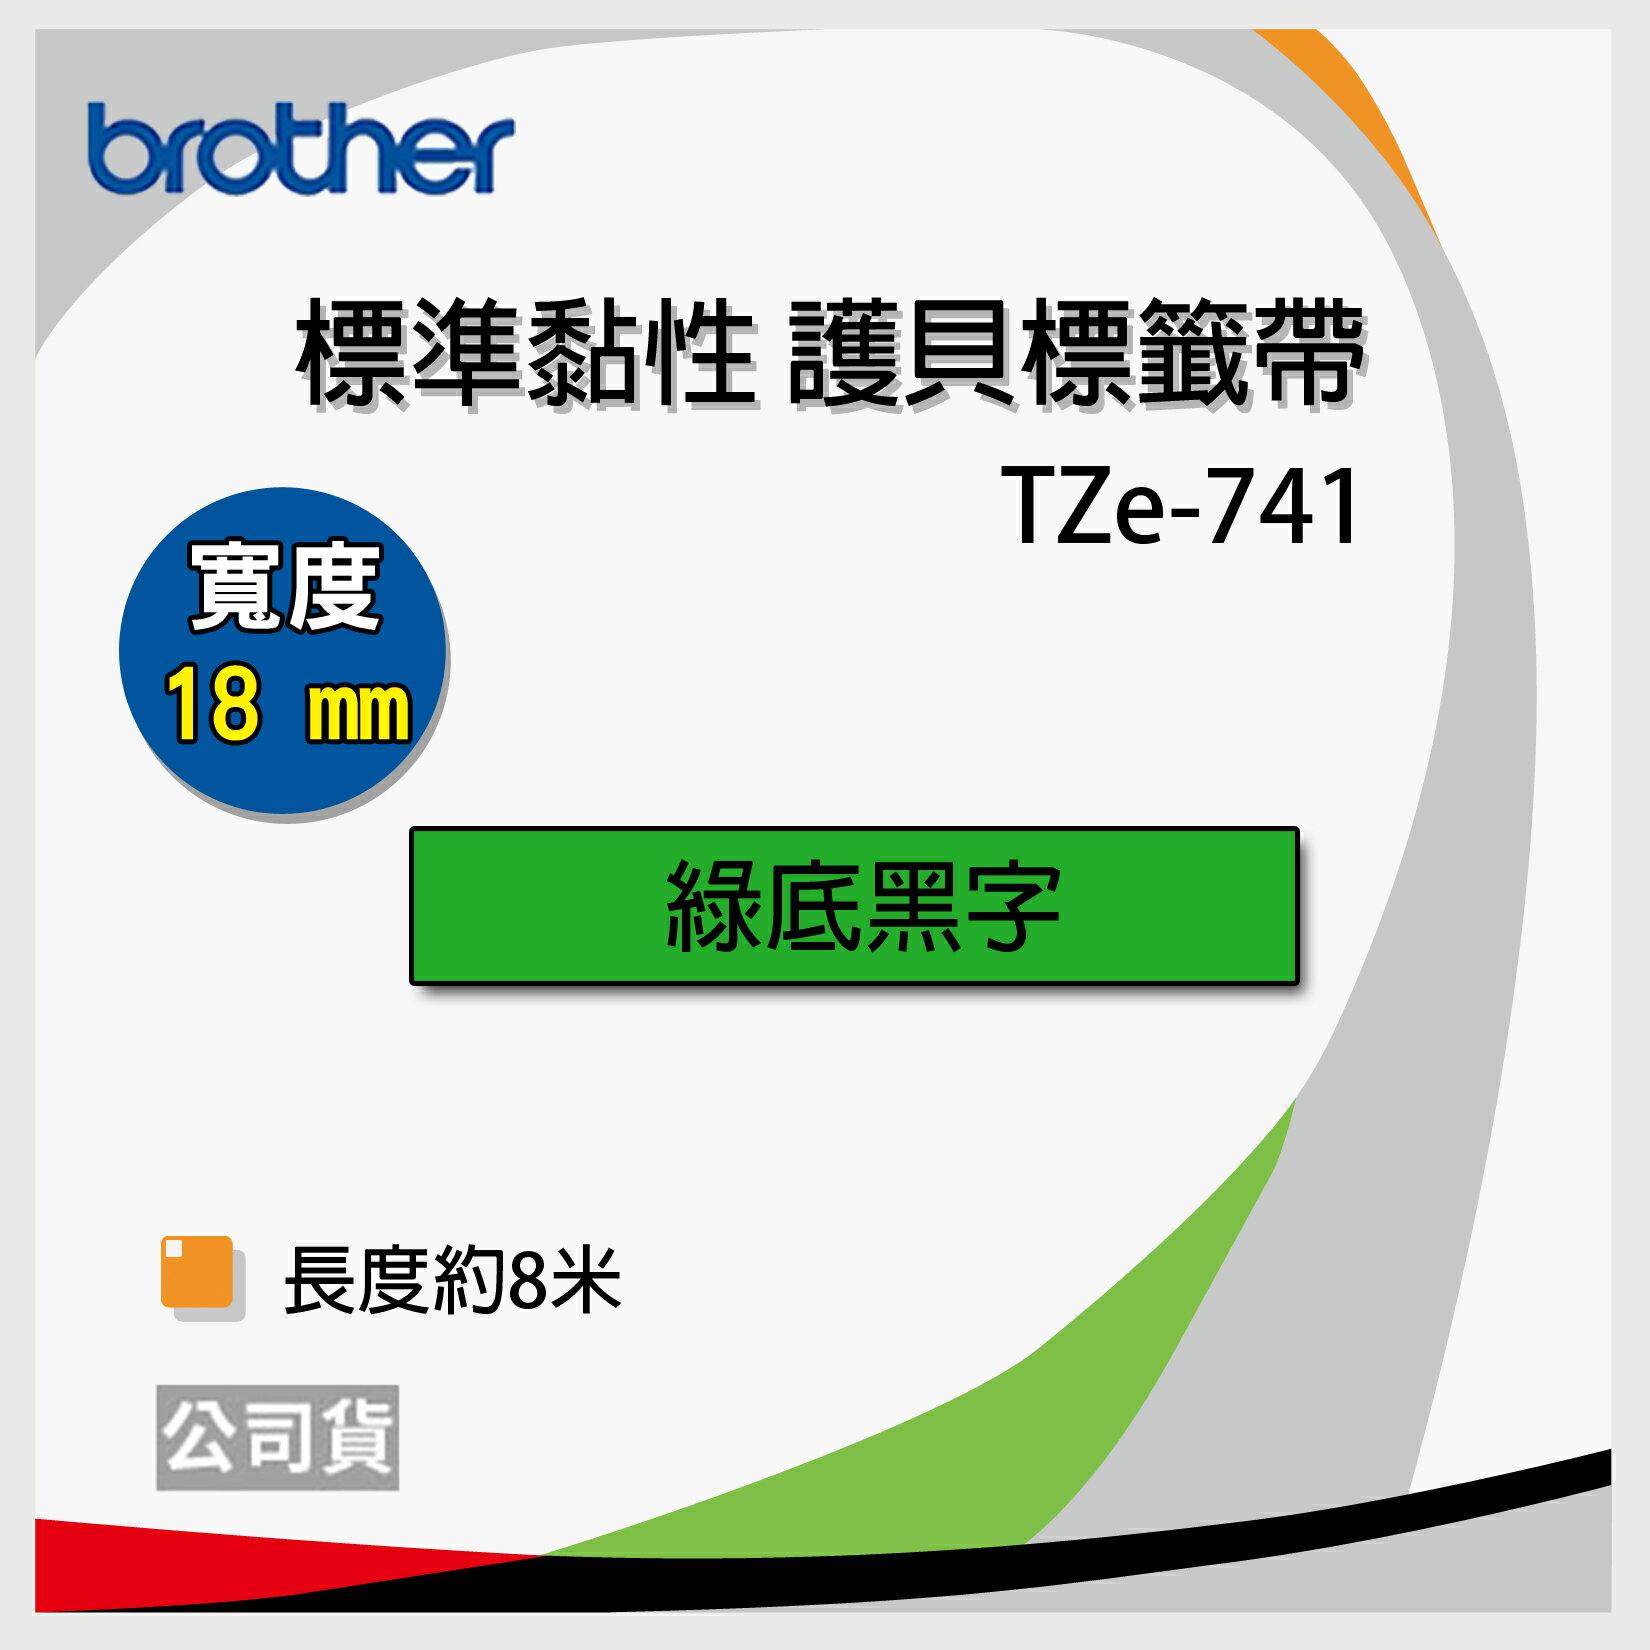 Brother 原廠護貝標籤帶 TZe-741 (18mm 綠底黑字 8m/卷)